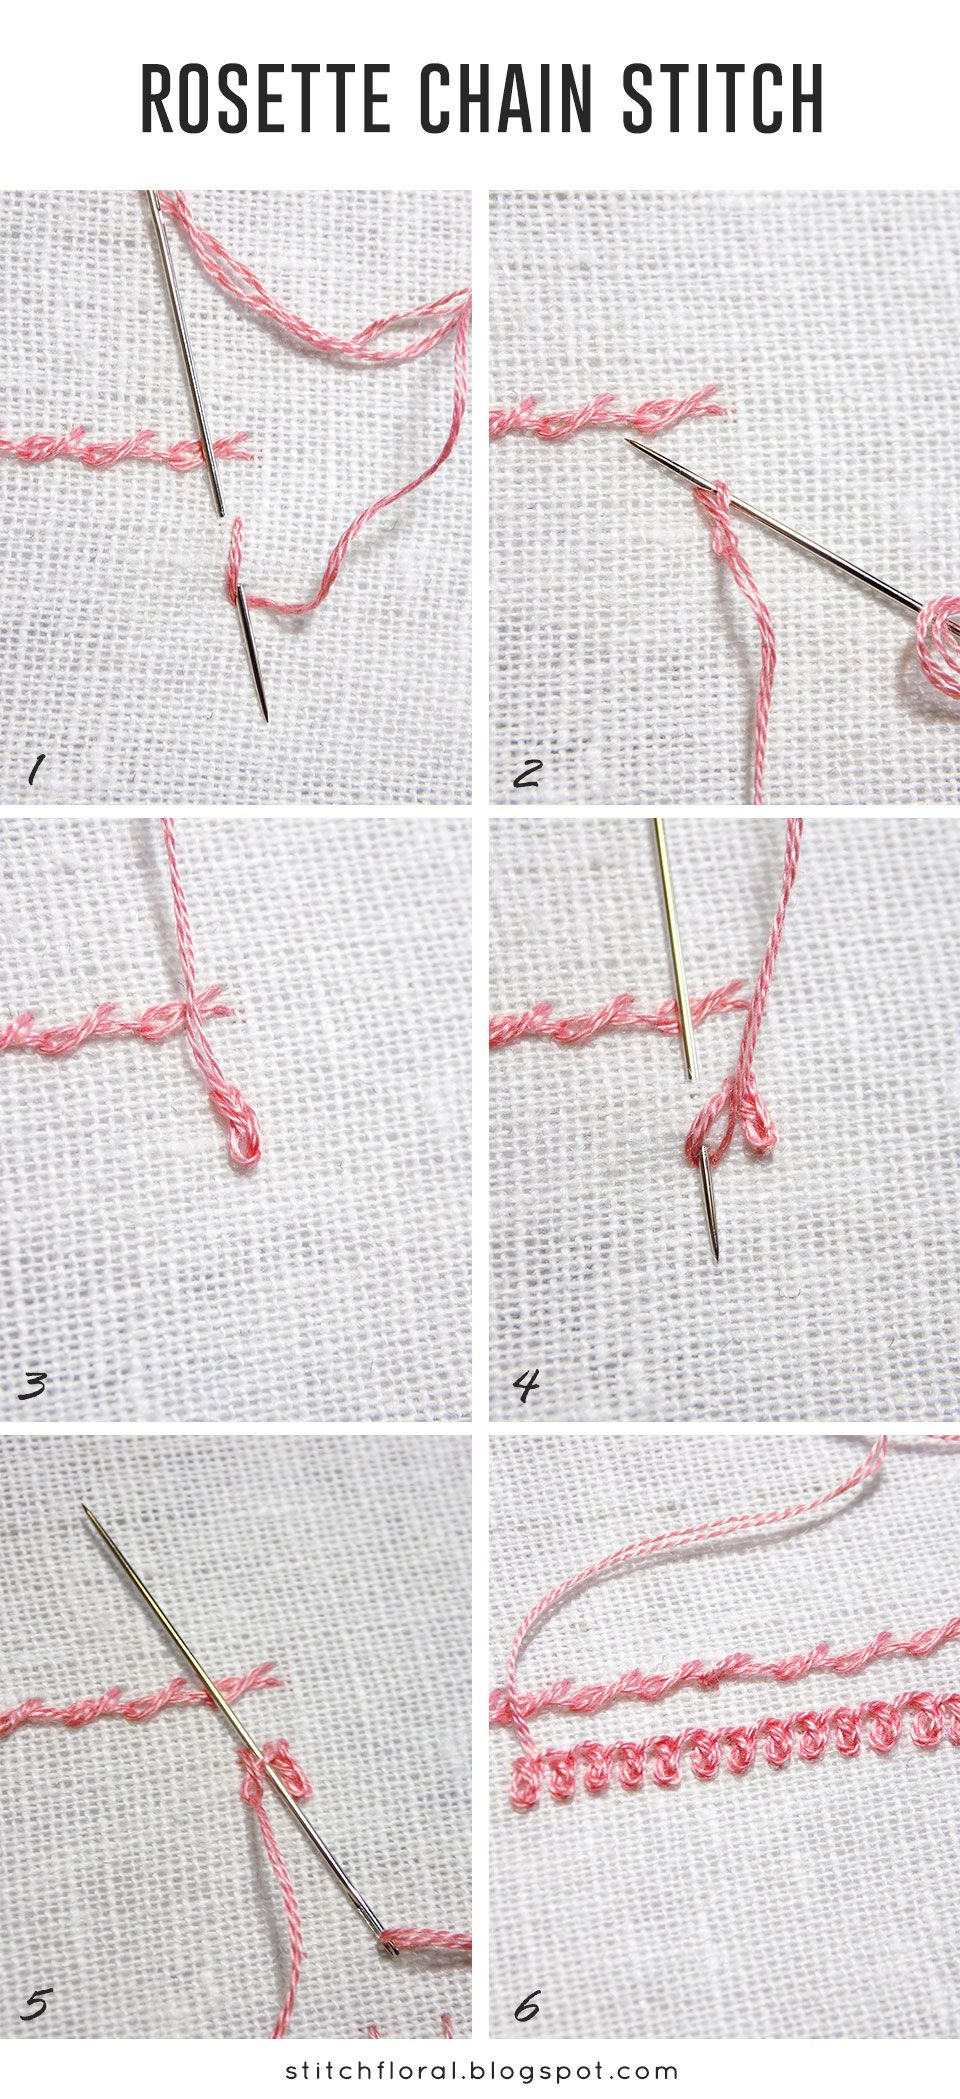 Chain Stitch Embroidery : chain, stitch, embroidery, Rosette, Chain, Stitch, Tutorial,, Embroidery, Stitches,, Stitching, Techniques,, Tutorials